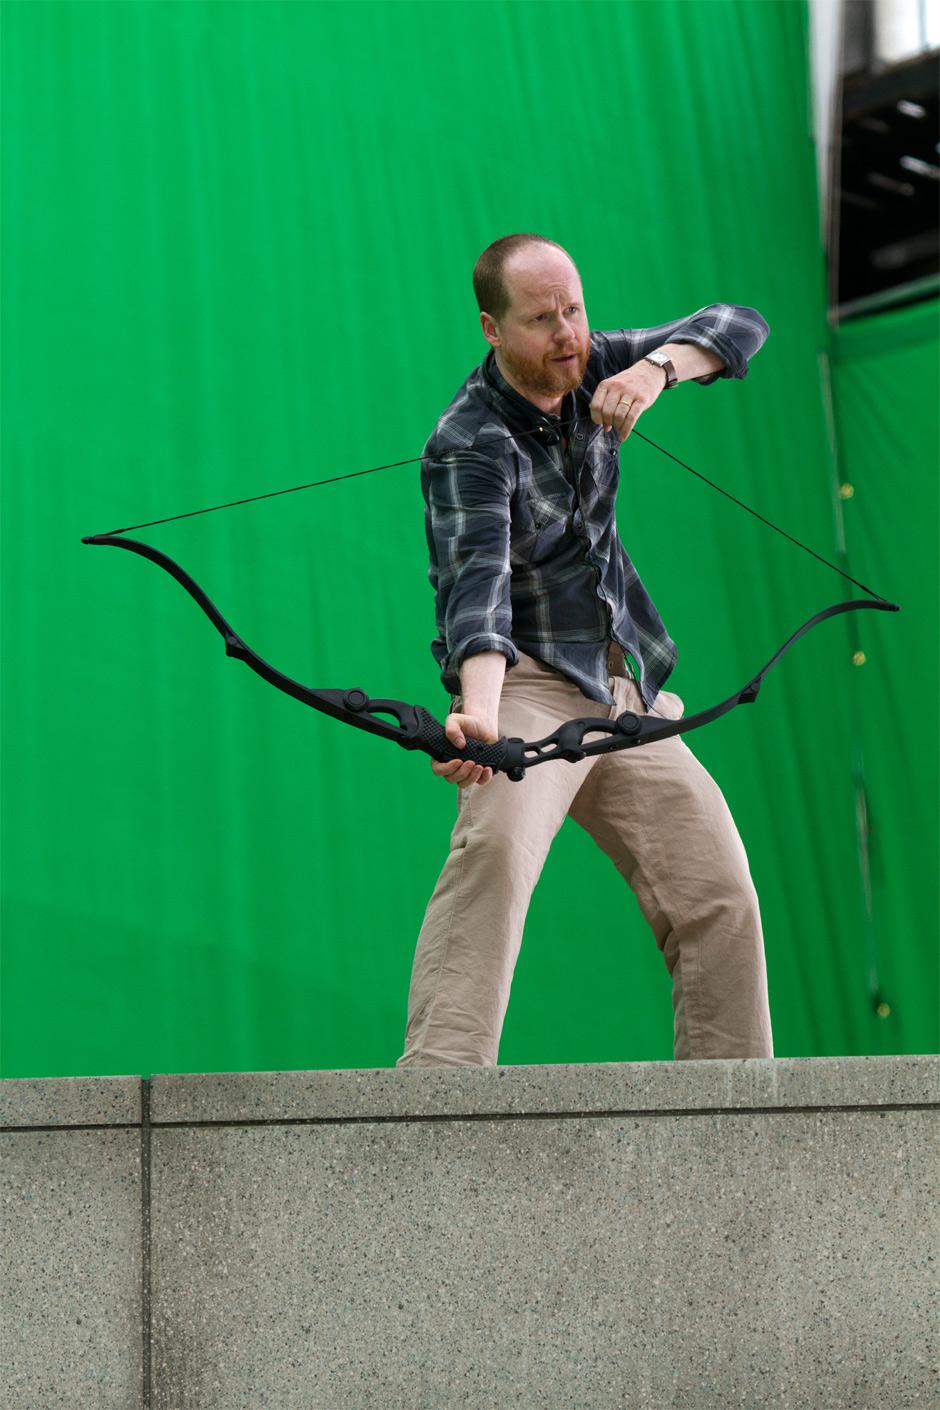 http://3.bp.blogspot.com/-xKjdP4Y425c/UCP7mTWb__I/AAAAAAAAGrs/xj6zoqogDiE/s1600/joss-whedon-avengers-set-photo-hawkeye-bow.jpg